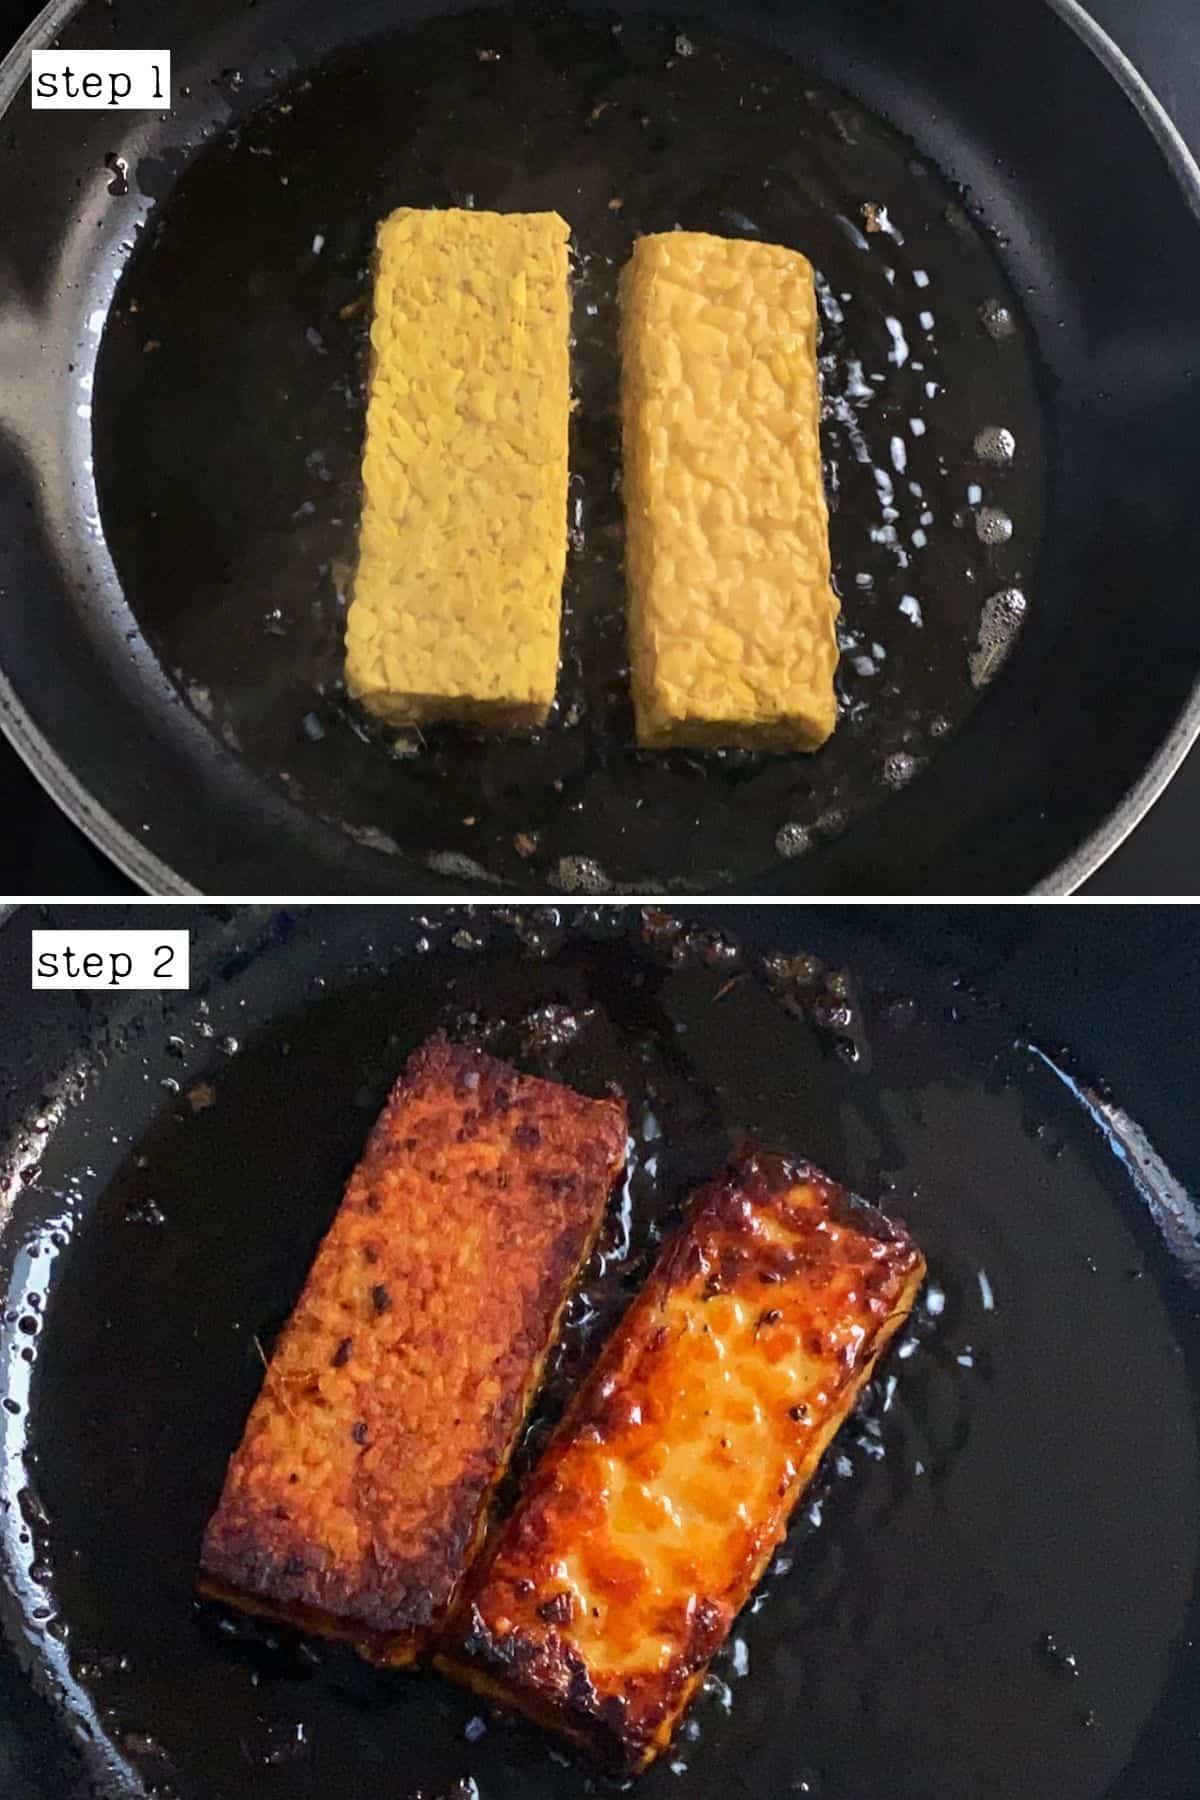 Steps for pan-frying tempeh